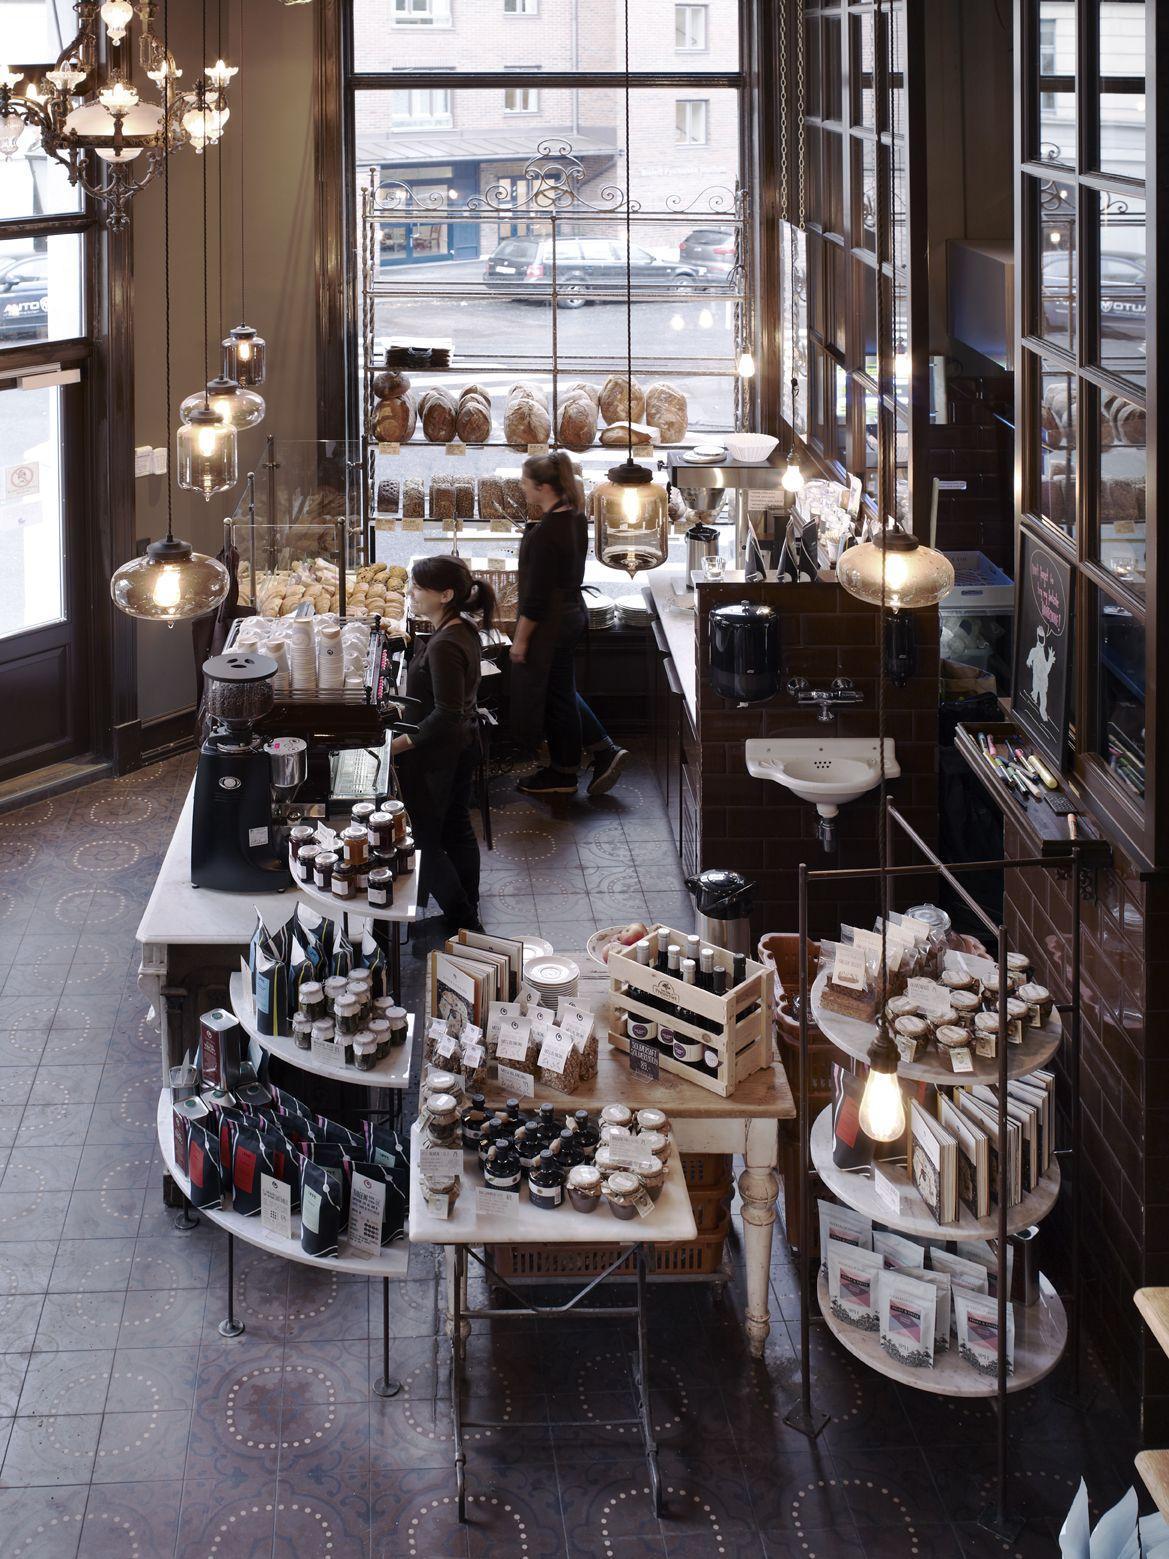 frydenlund cafÉ frydenlund cafÉ on a corner of glee lund gata and